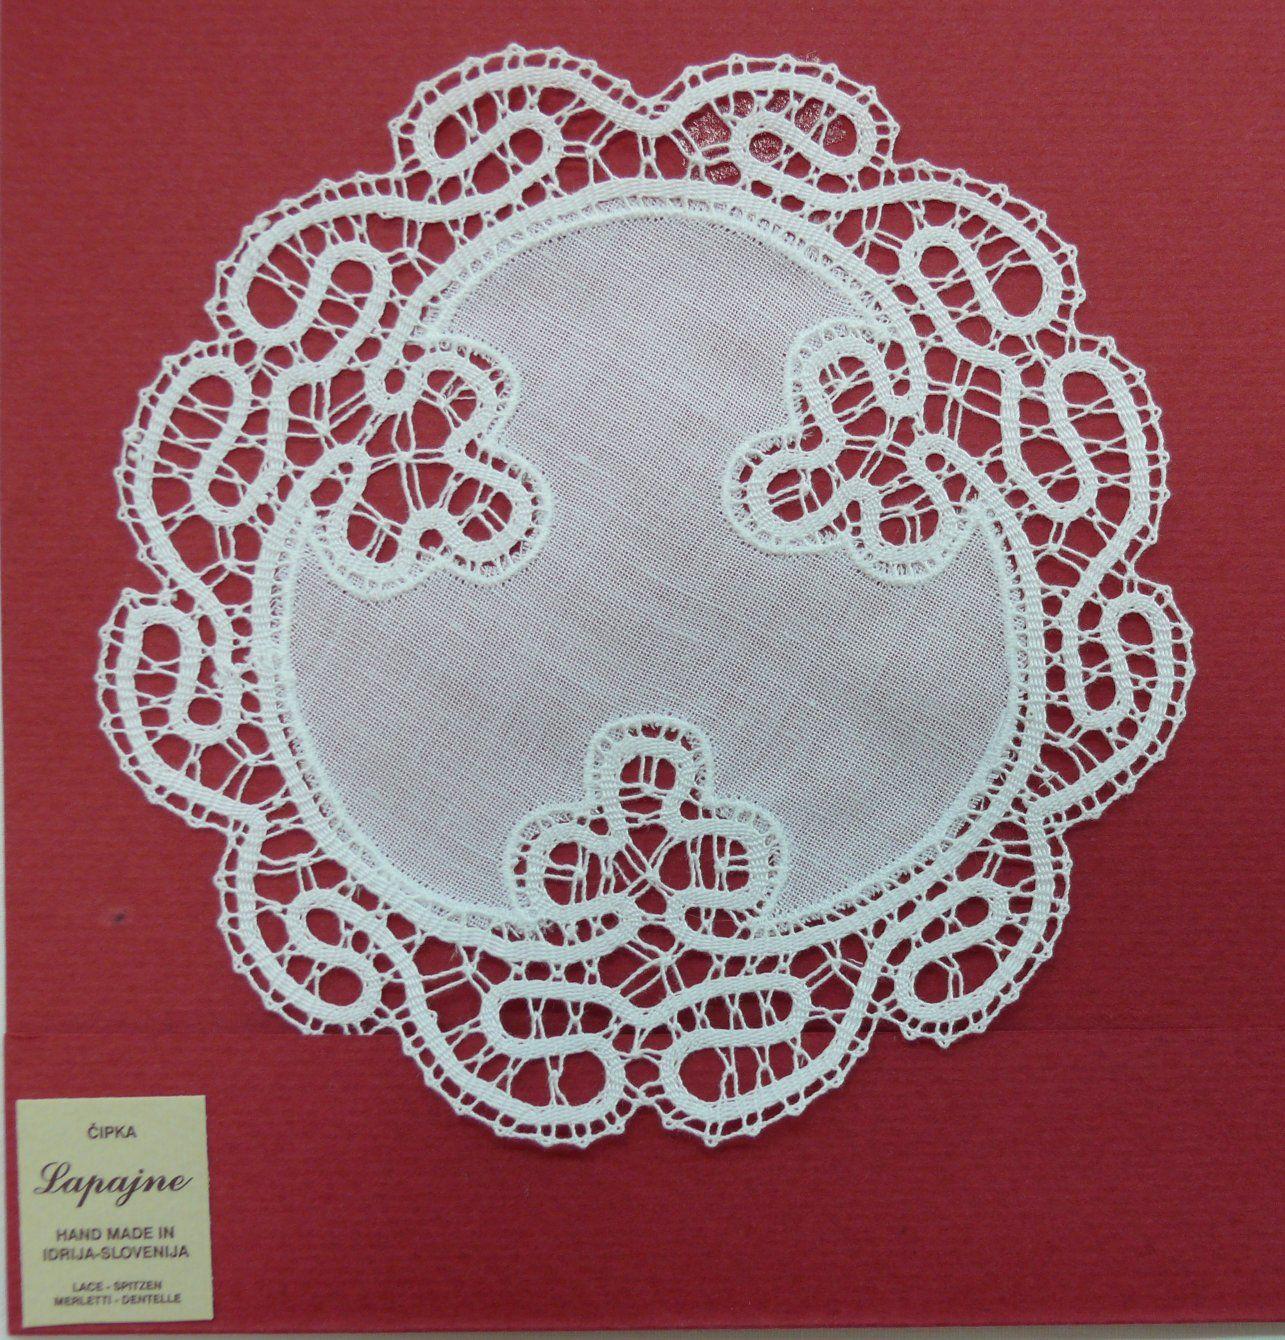 IDRIJA LACE A hand made bobbin lace   bobbin lace   Pinterest ...